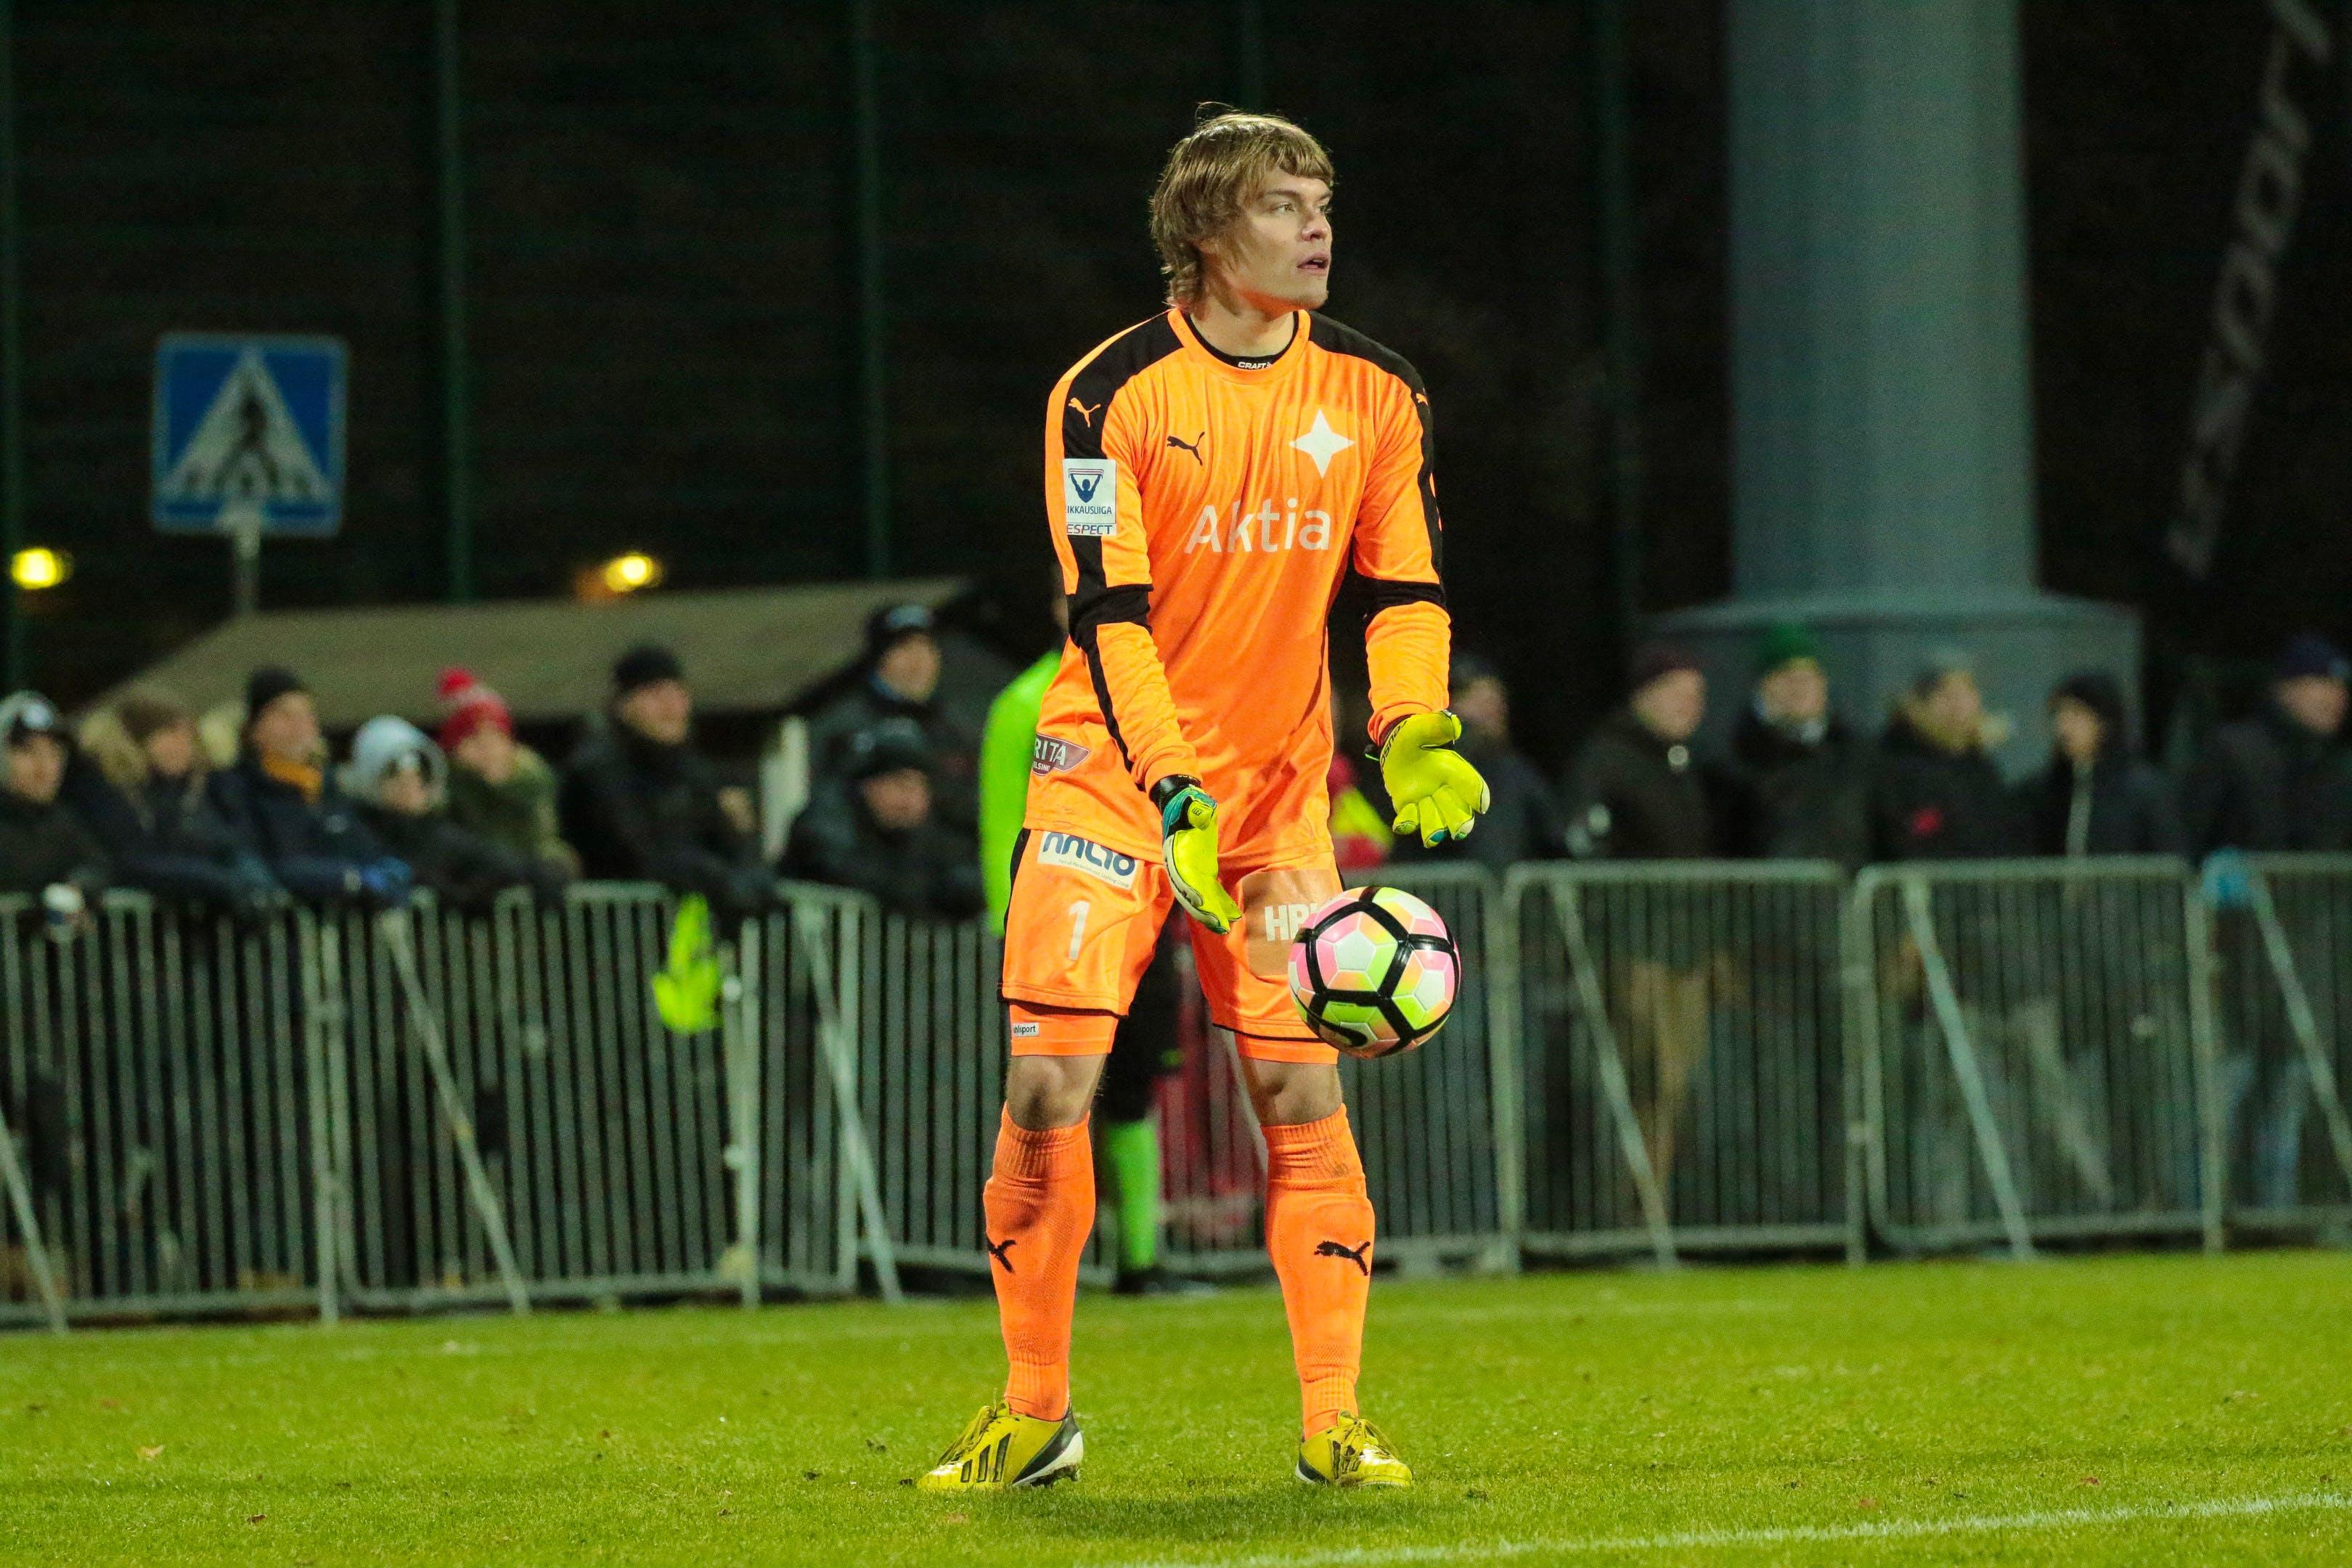 Daniel Kollar siirtyy HIFK:hon